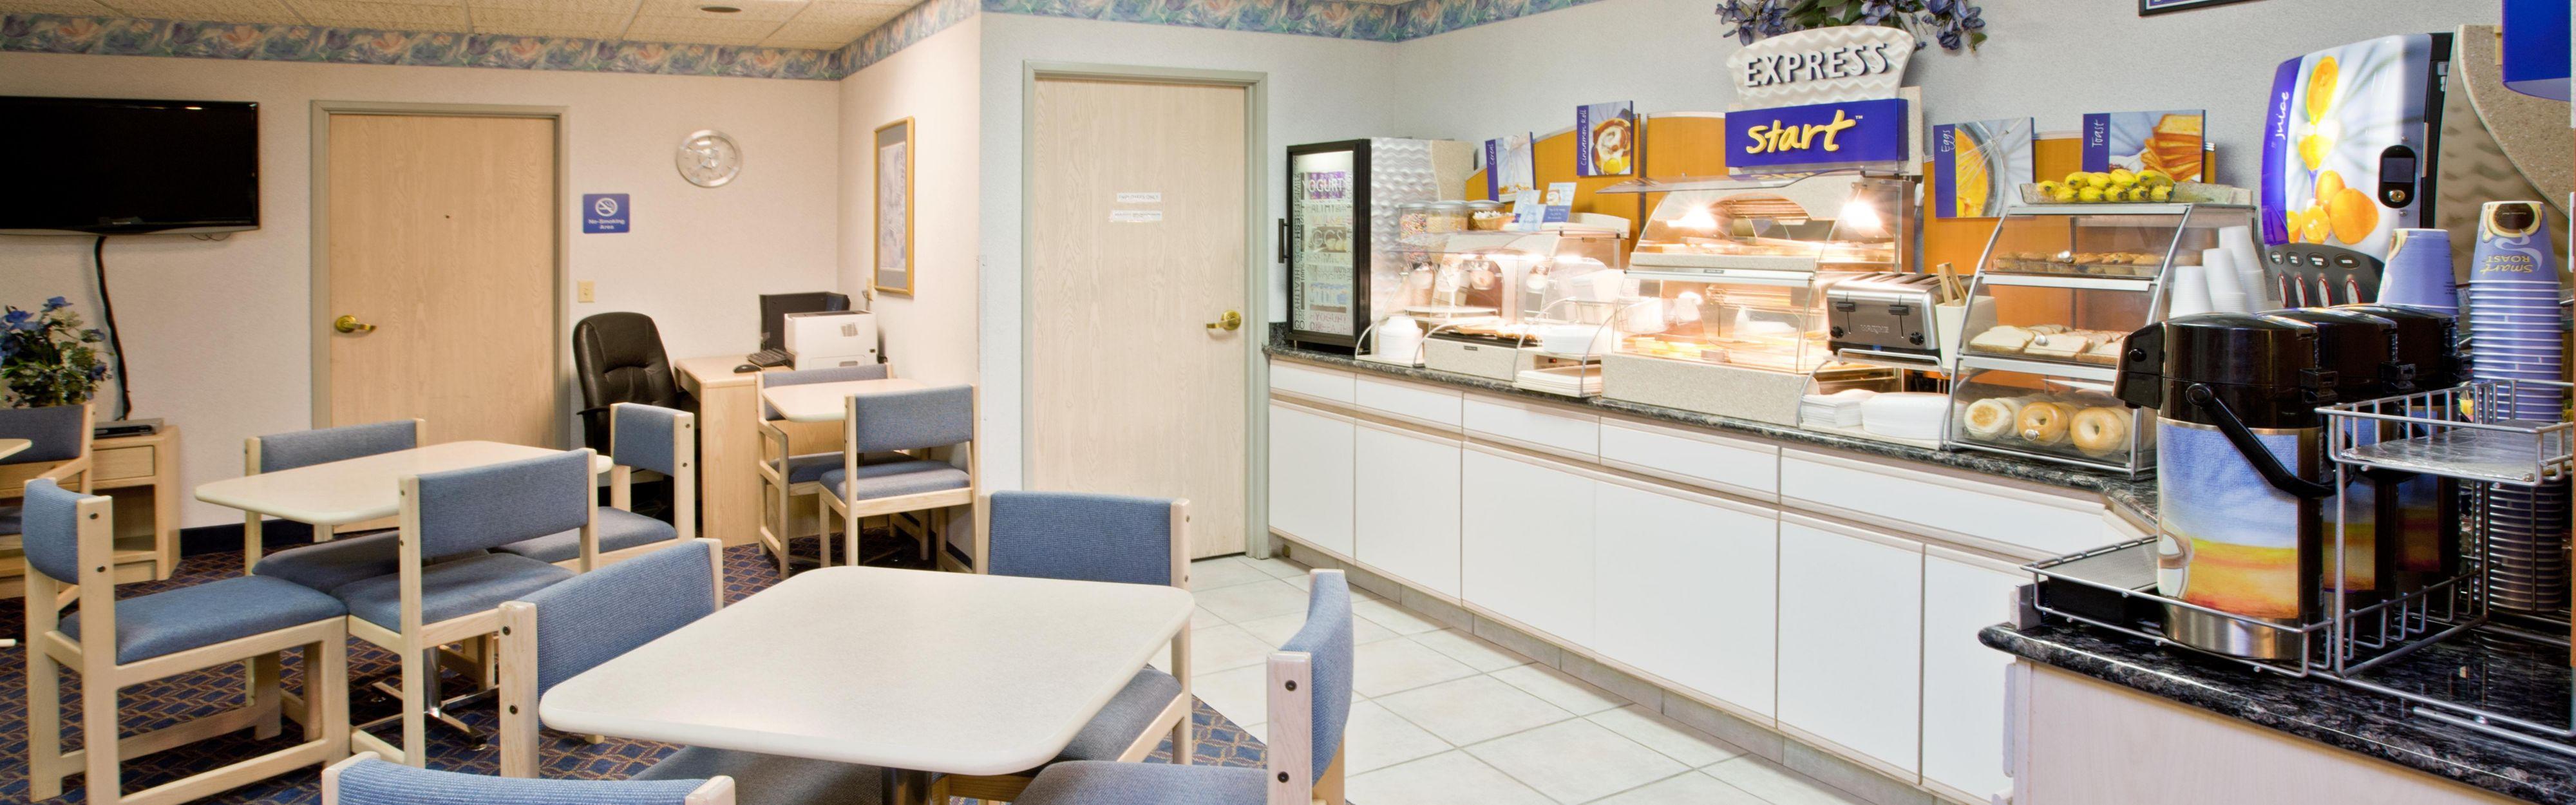 holiday inn express elkhart north i 80 90 ex 92 closed. Black Bedroom Furniture Sets. Home Design Ideas